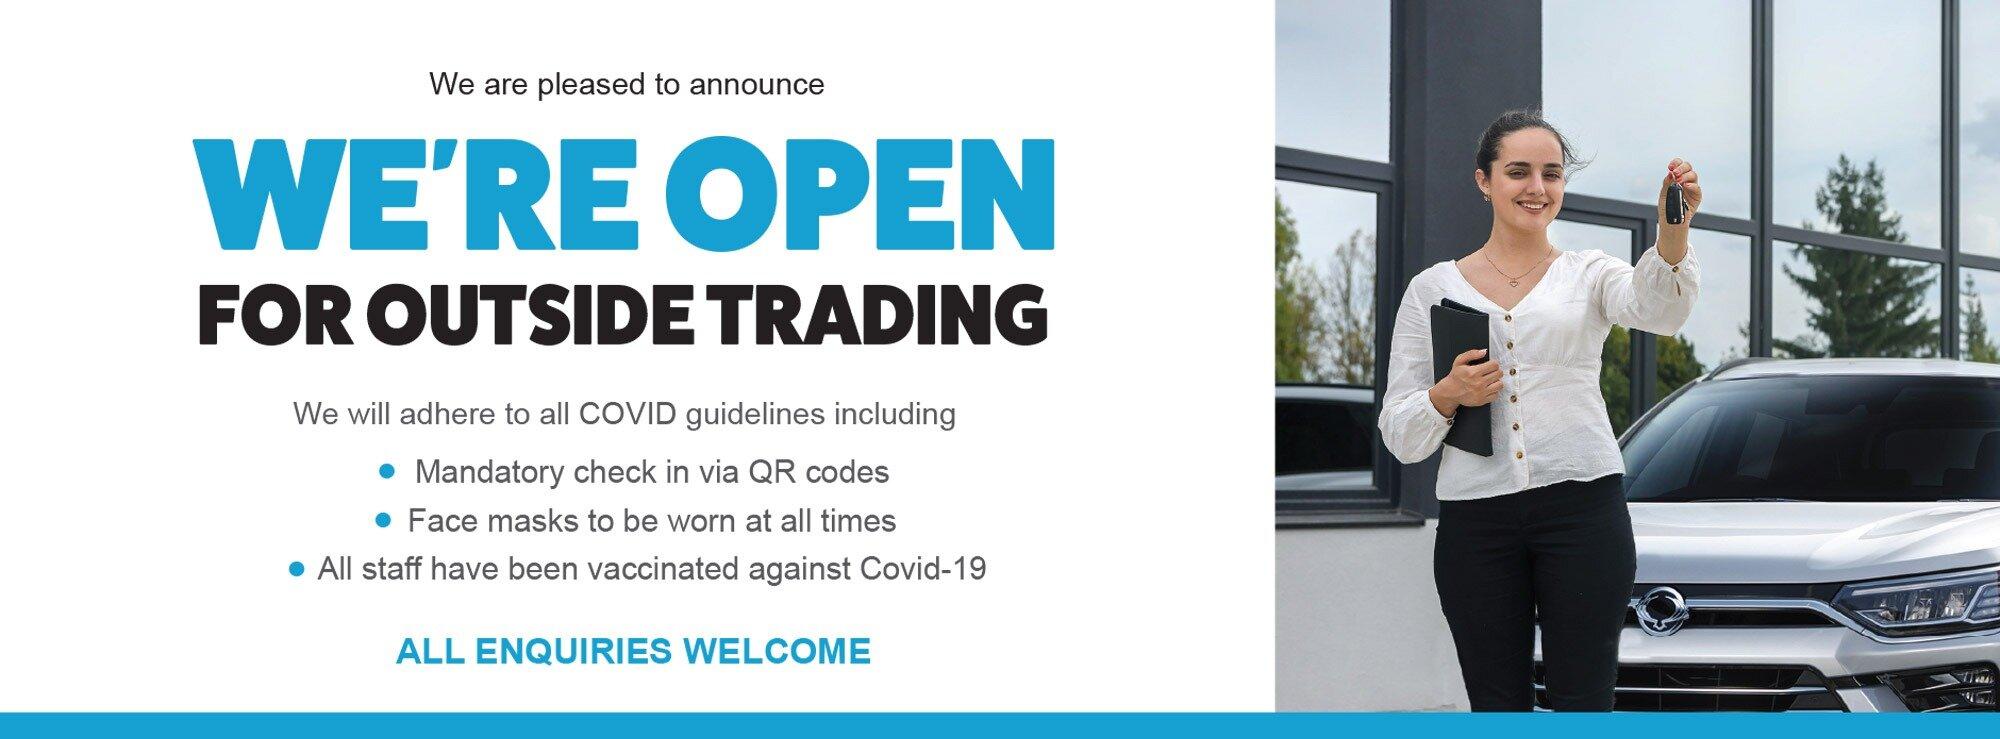 Open for outside trading